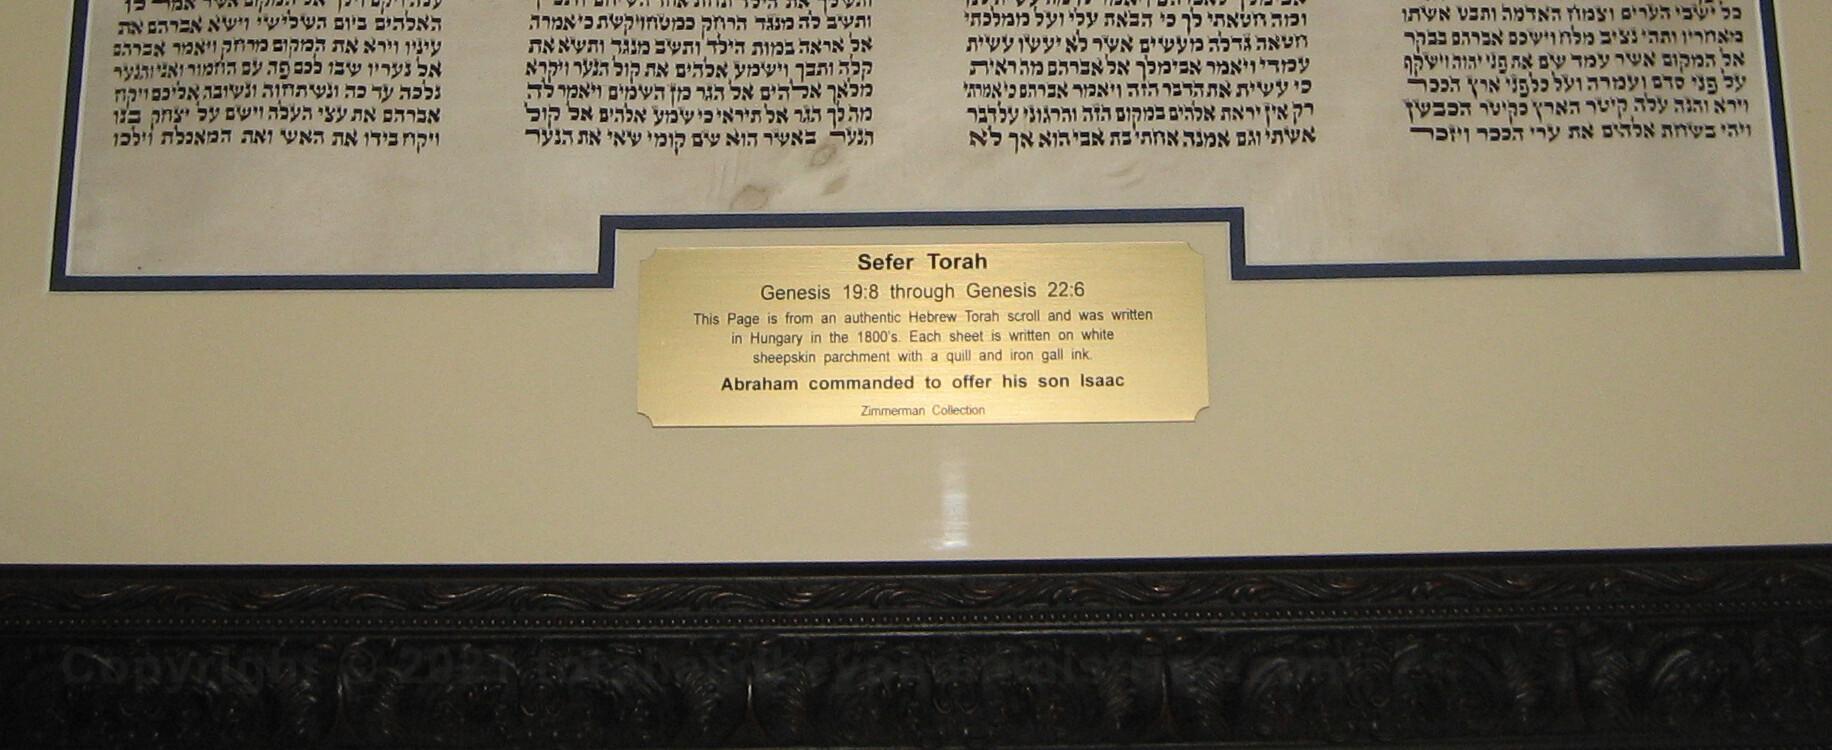 Information about this Torah sheet